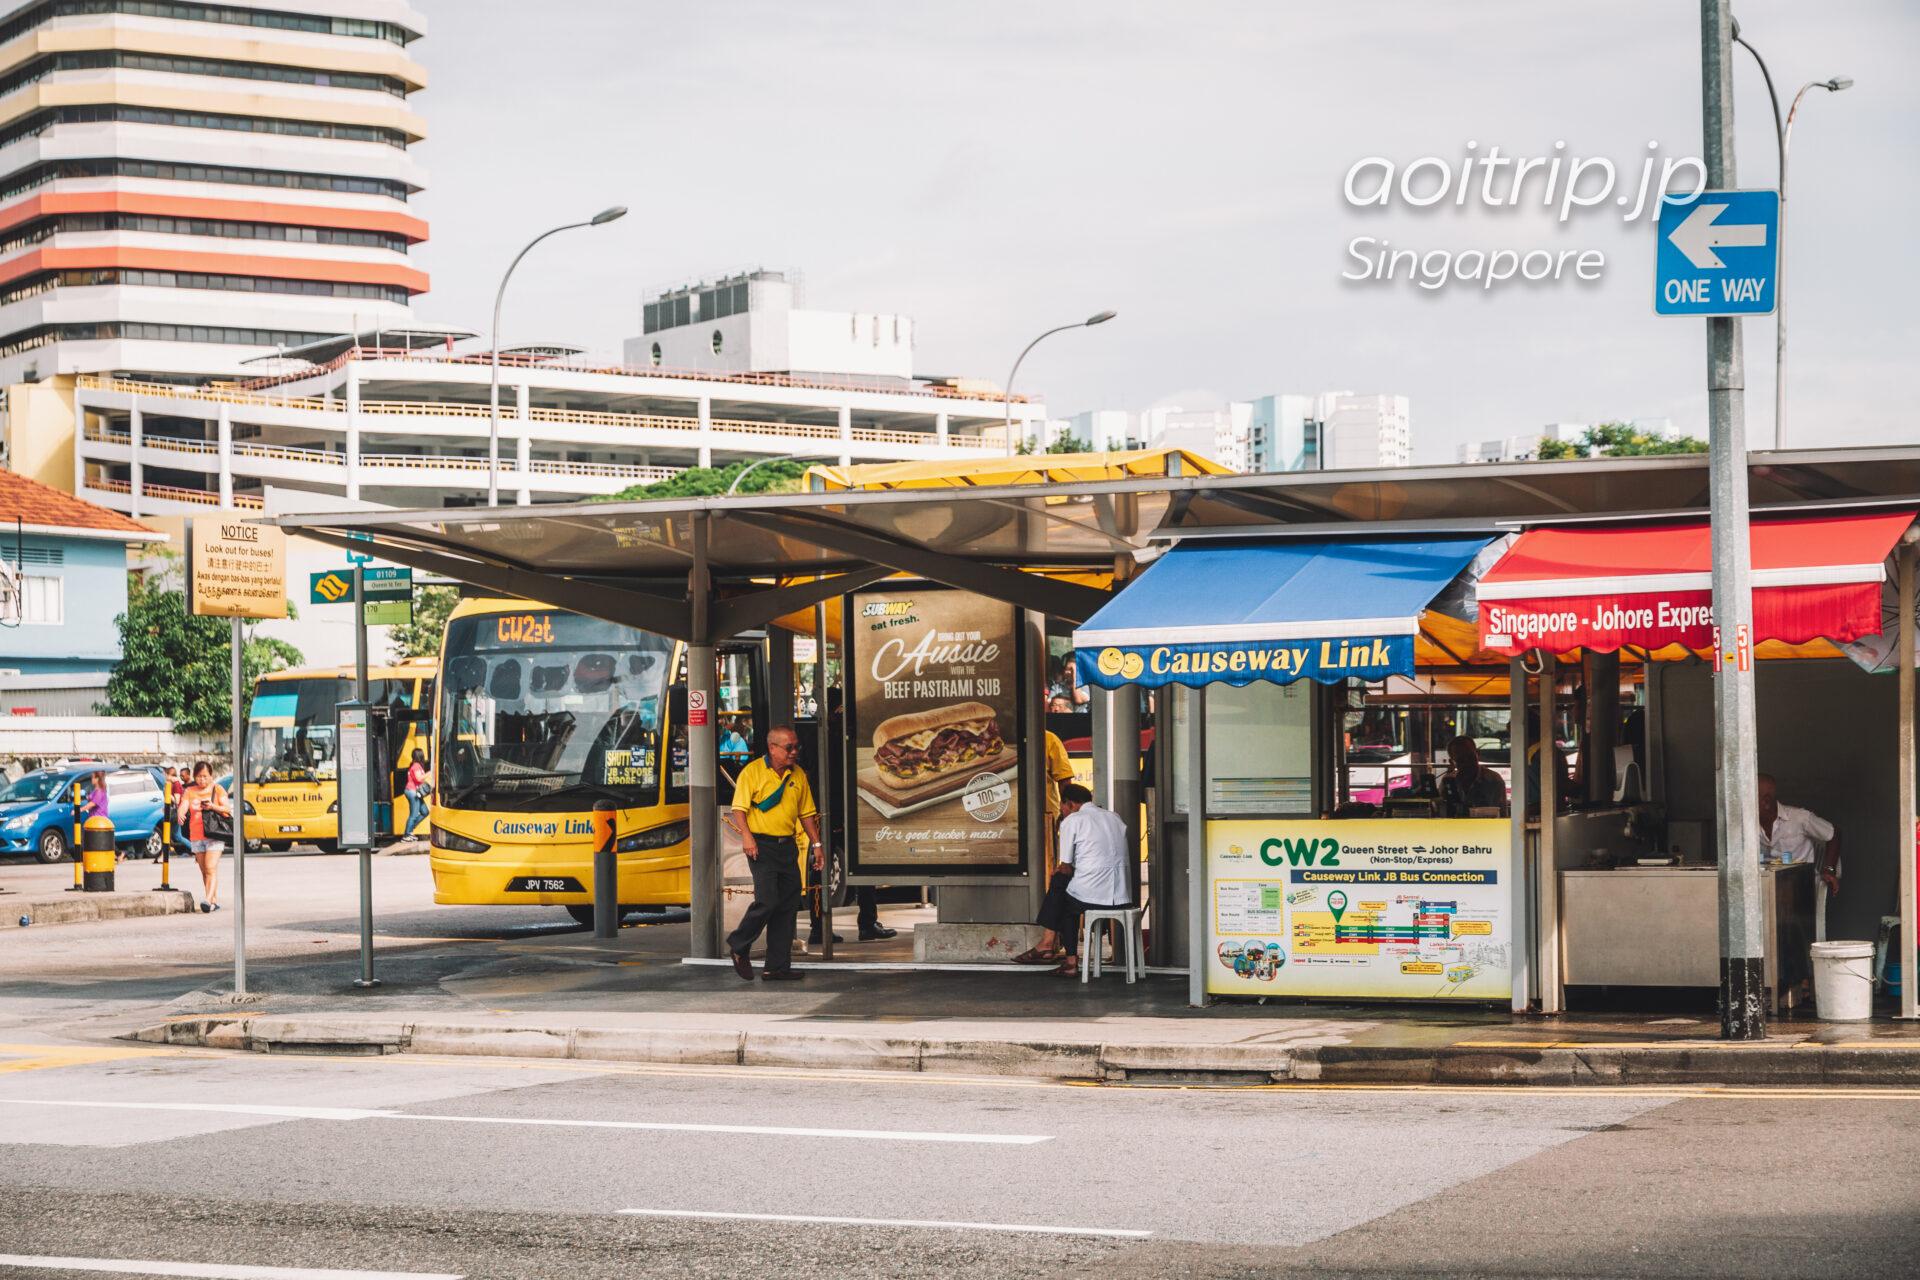 Queen Street ジョホールバル行きバス乗り場